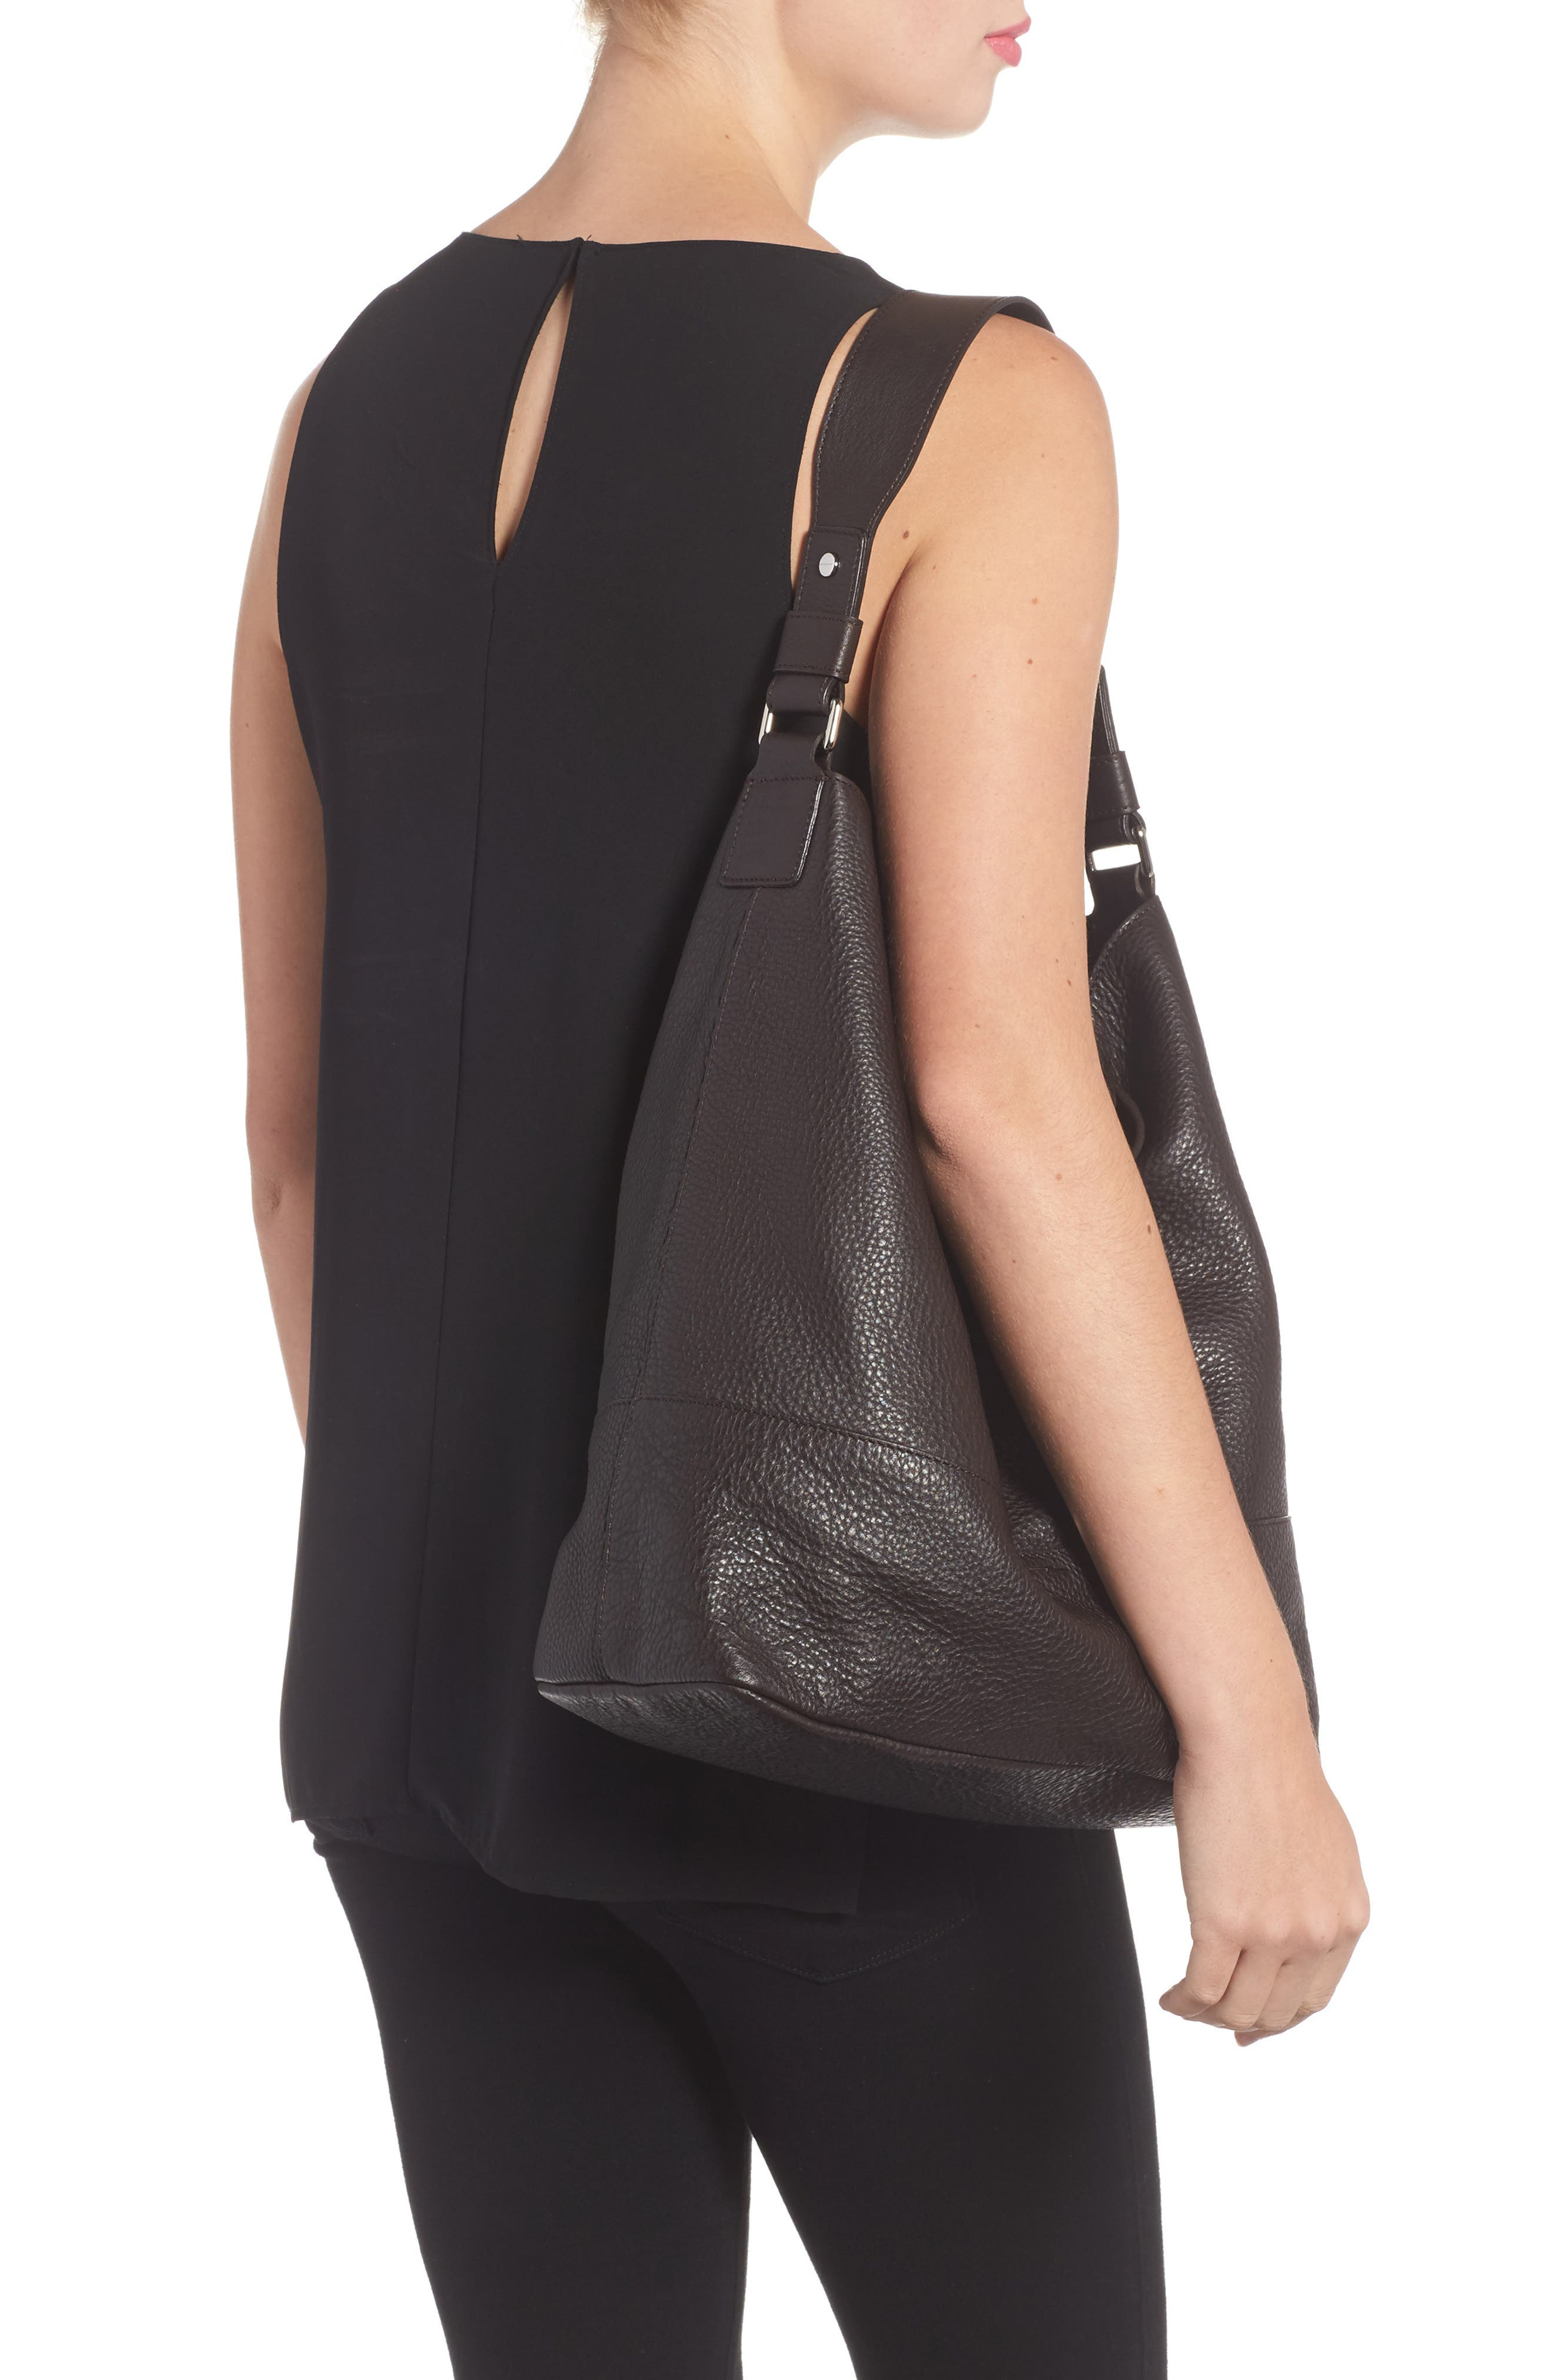 SHINOLA,                             Relaxed Calfskin Leather Hobo Bag,                             Alternate thumbnail 2, color,                             240